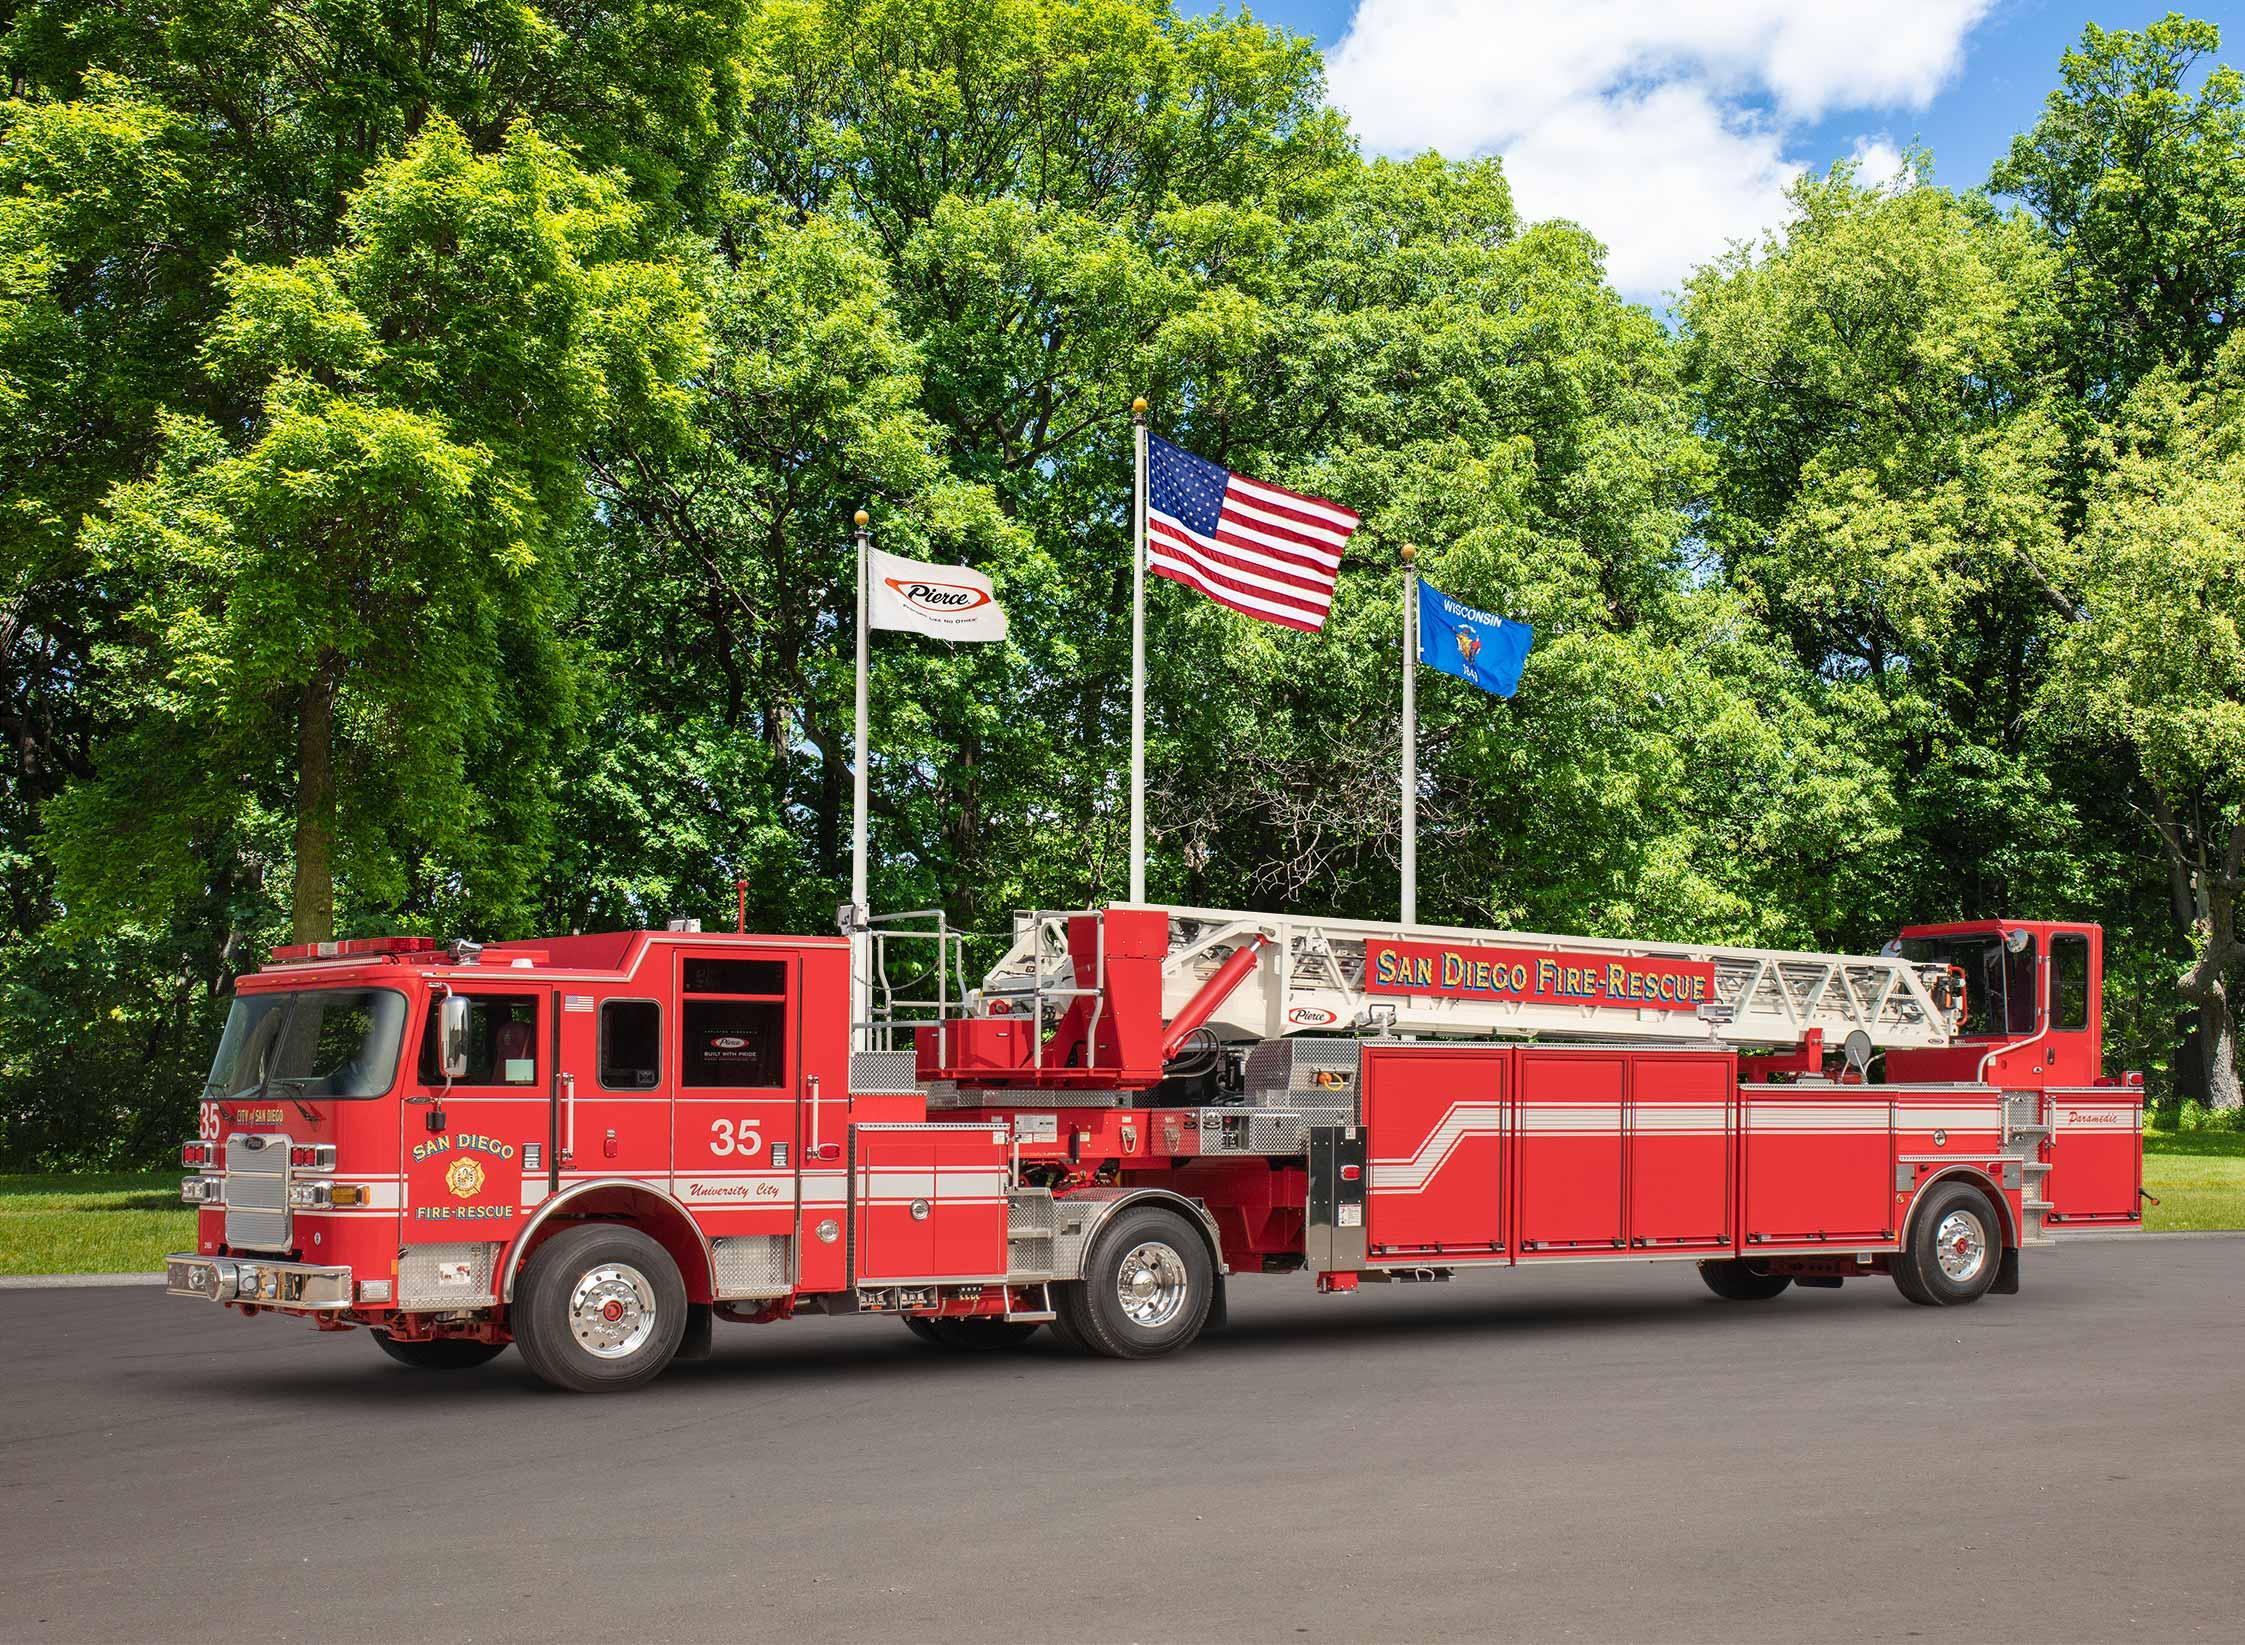 San Diego Fire-Rescue - Aerial